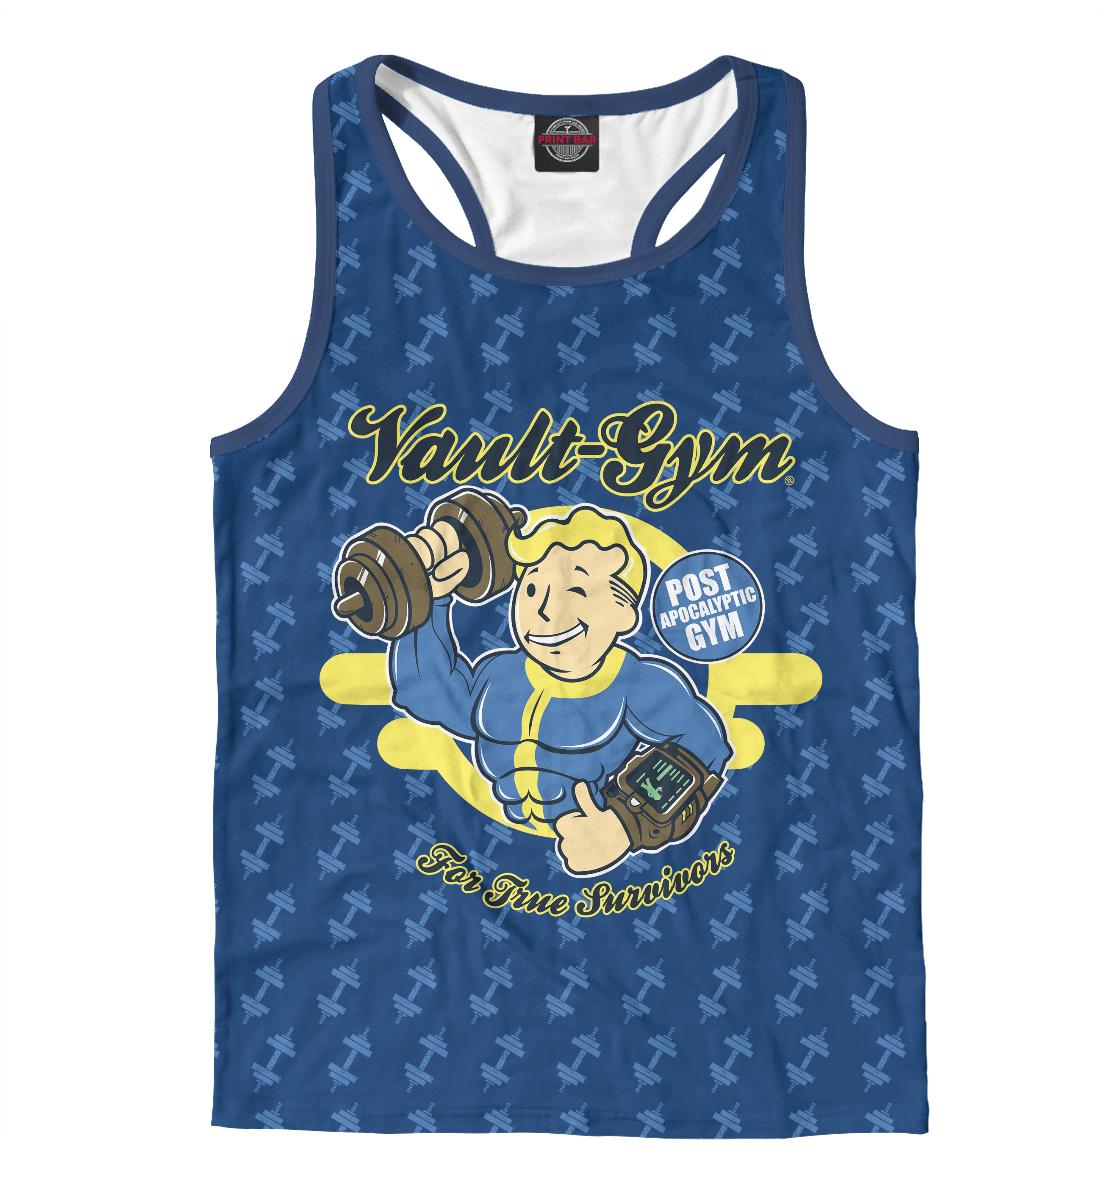 Vault Gym